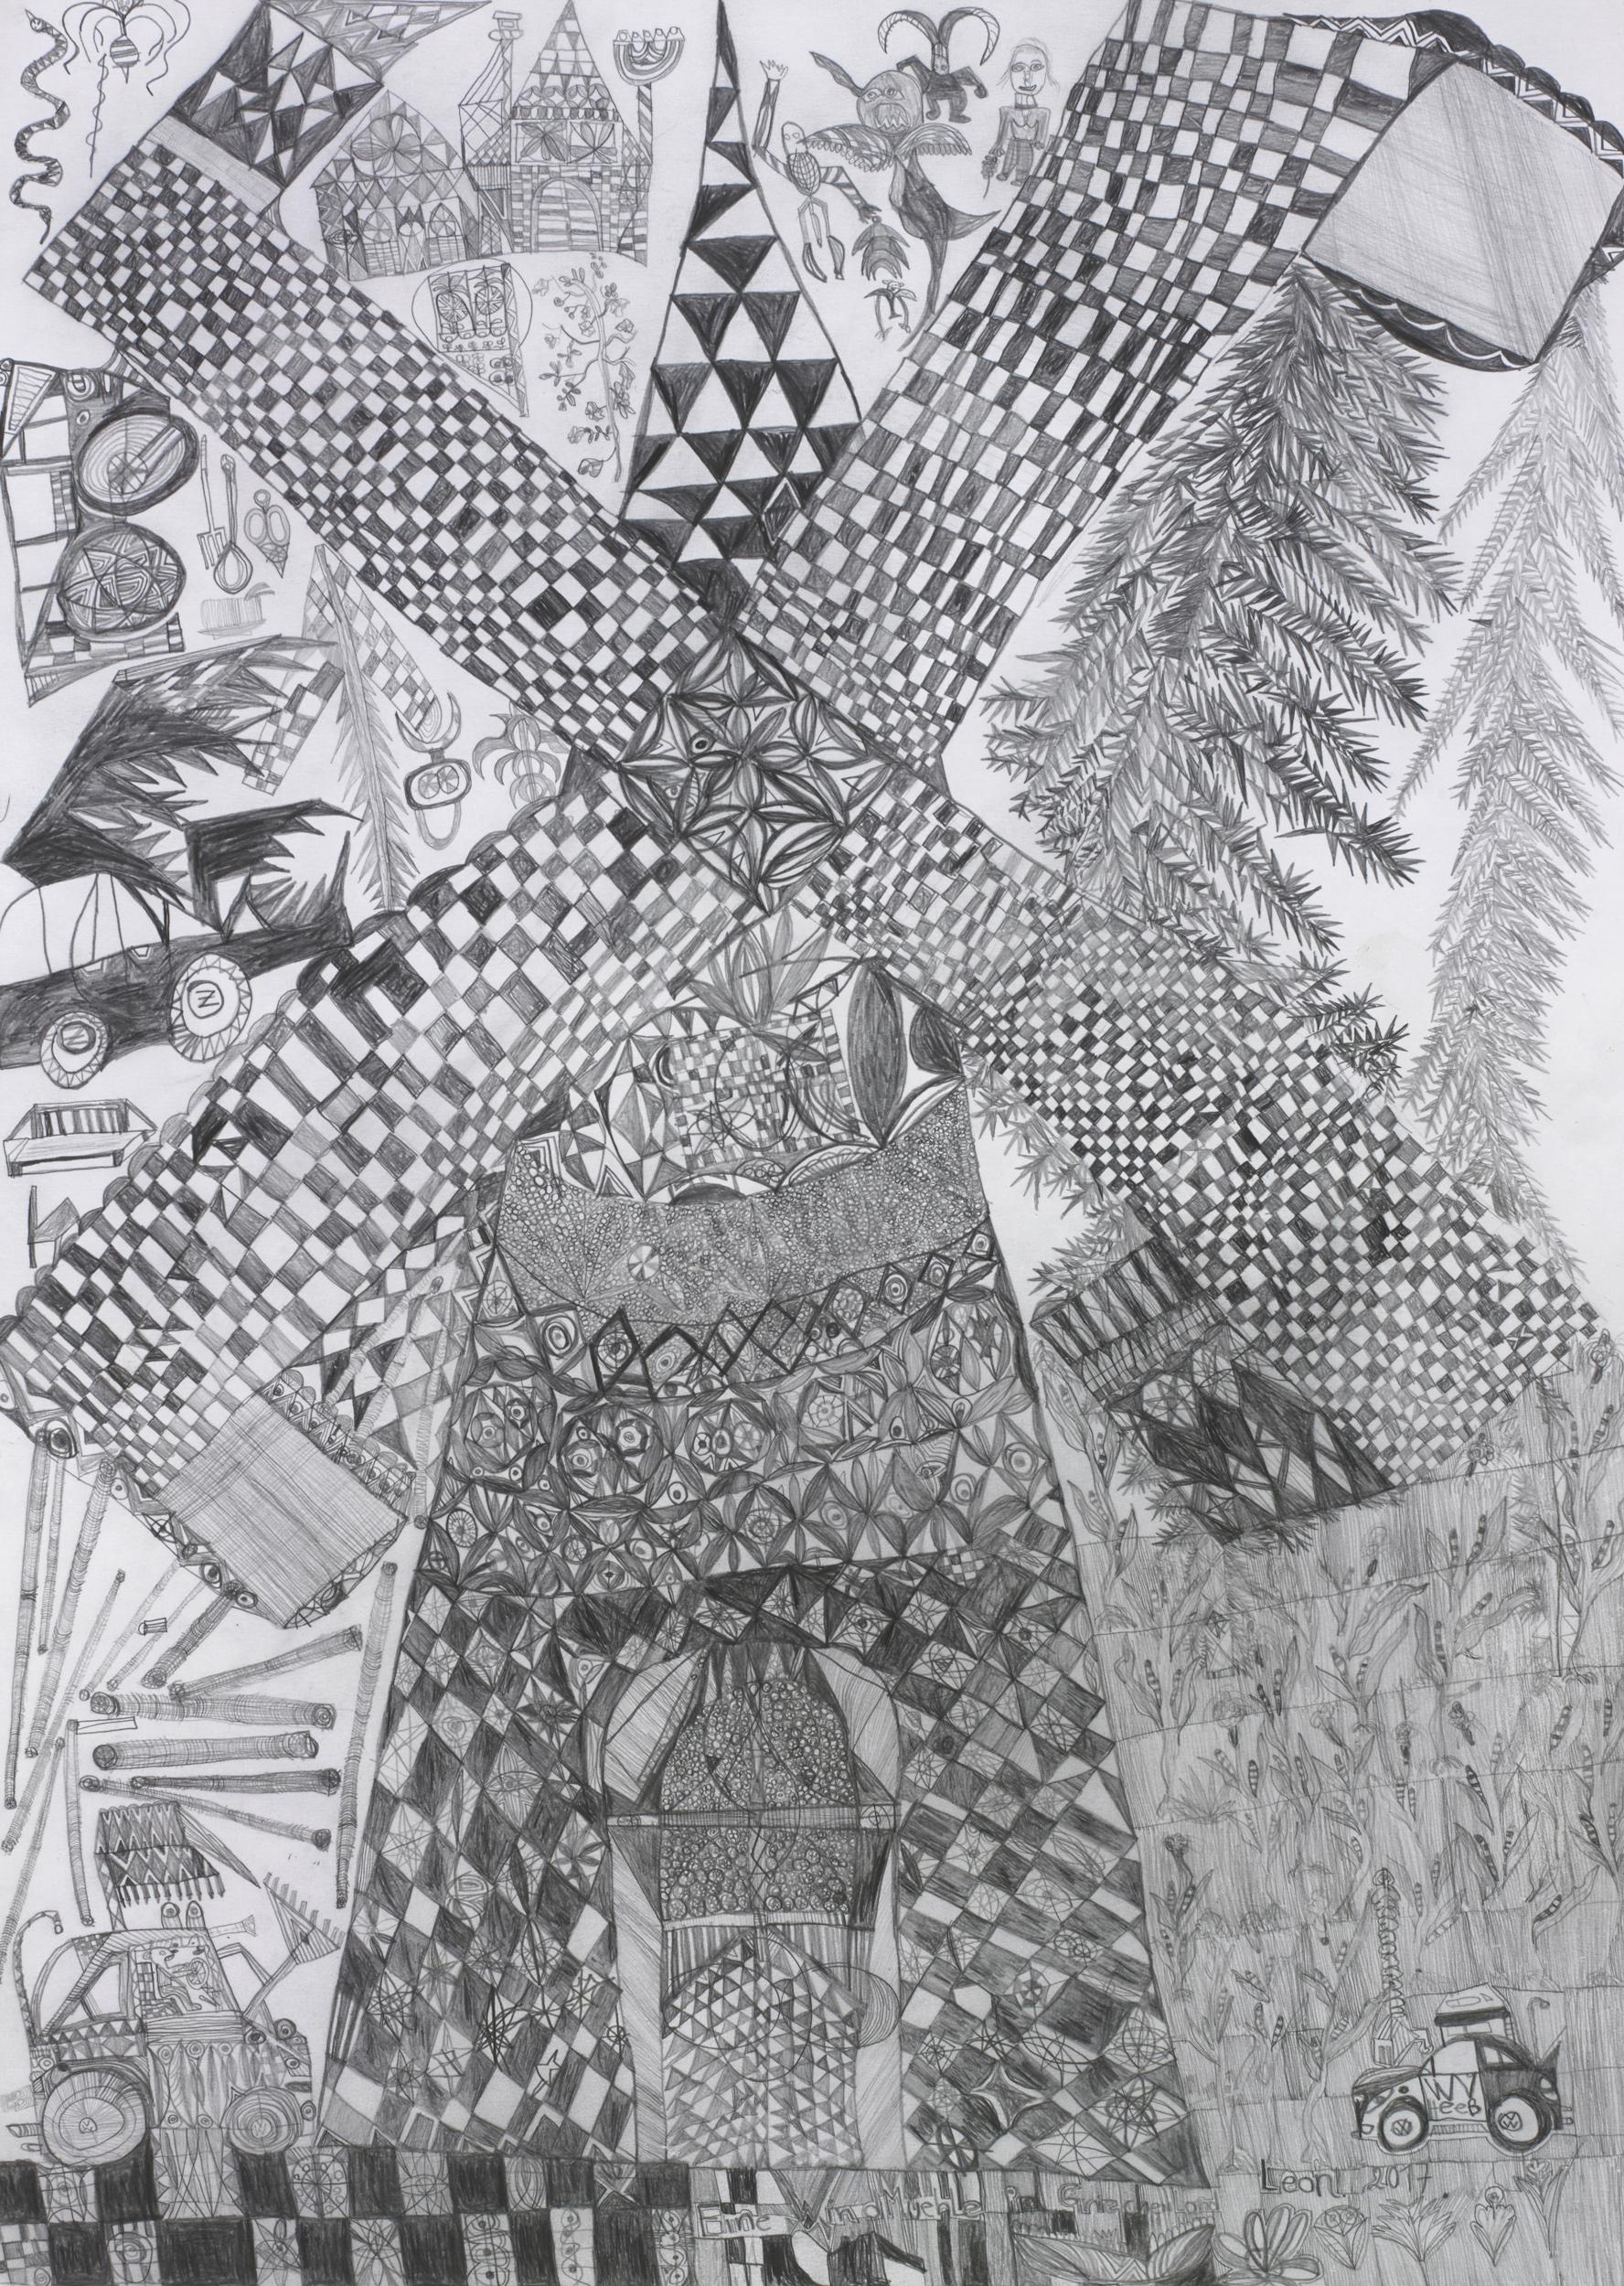 fink leonhard - julia